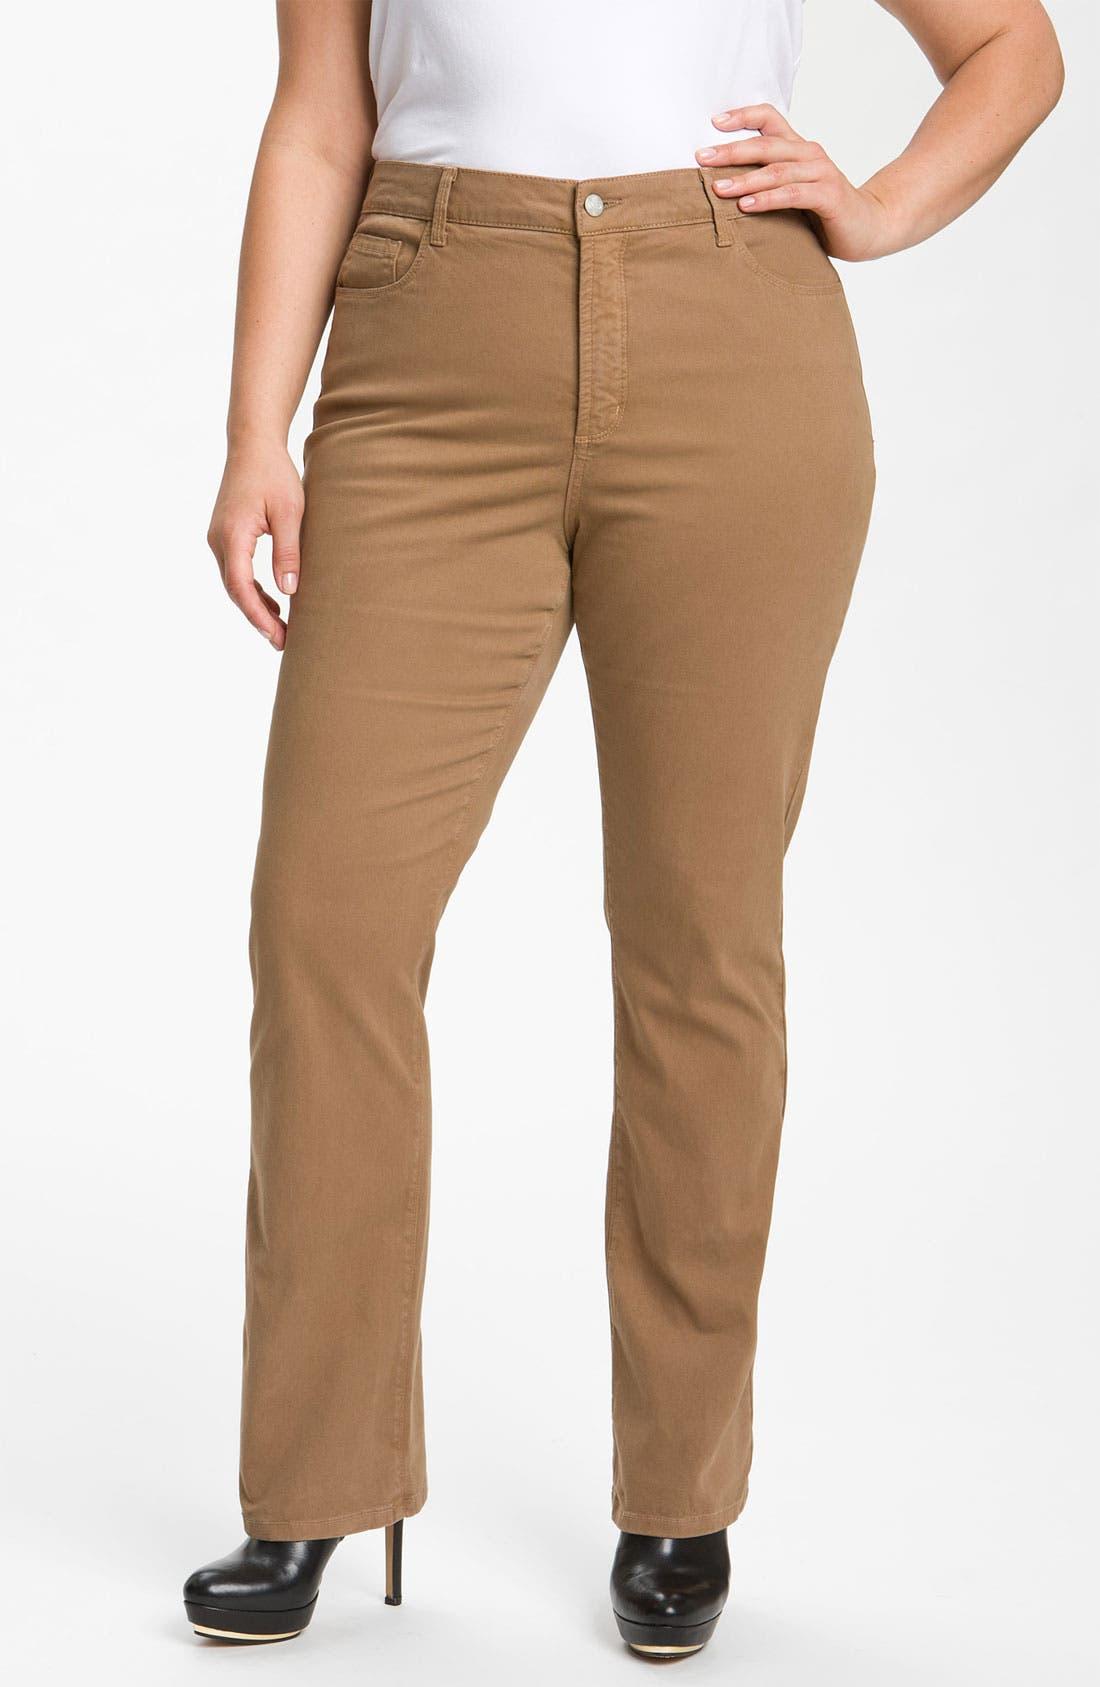 Main Image - NYDJ 'Marilyn' Straight Leg Stretch Twill Jeans (Plus)